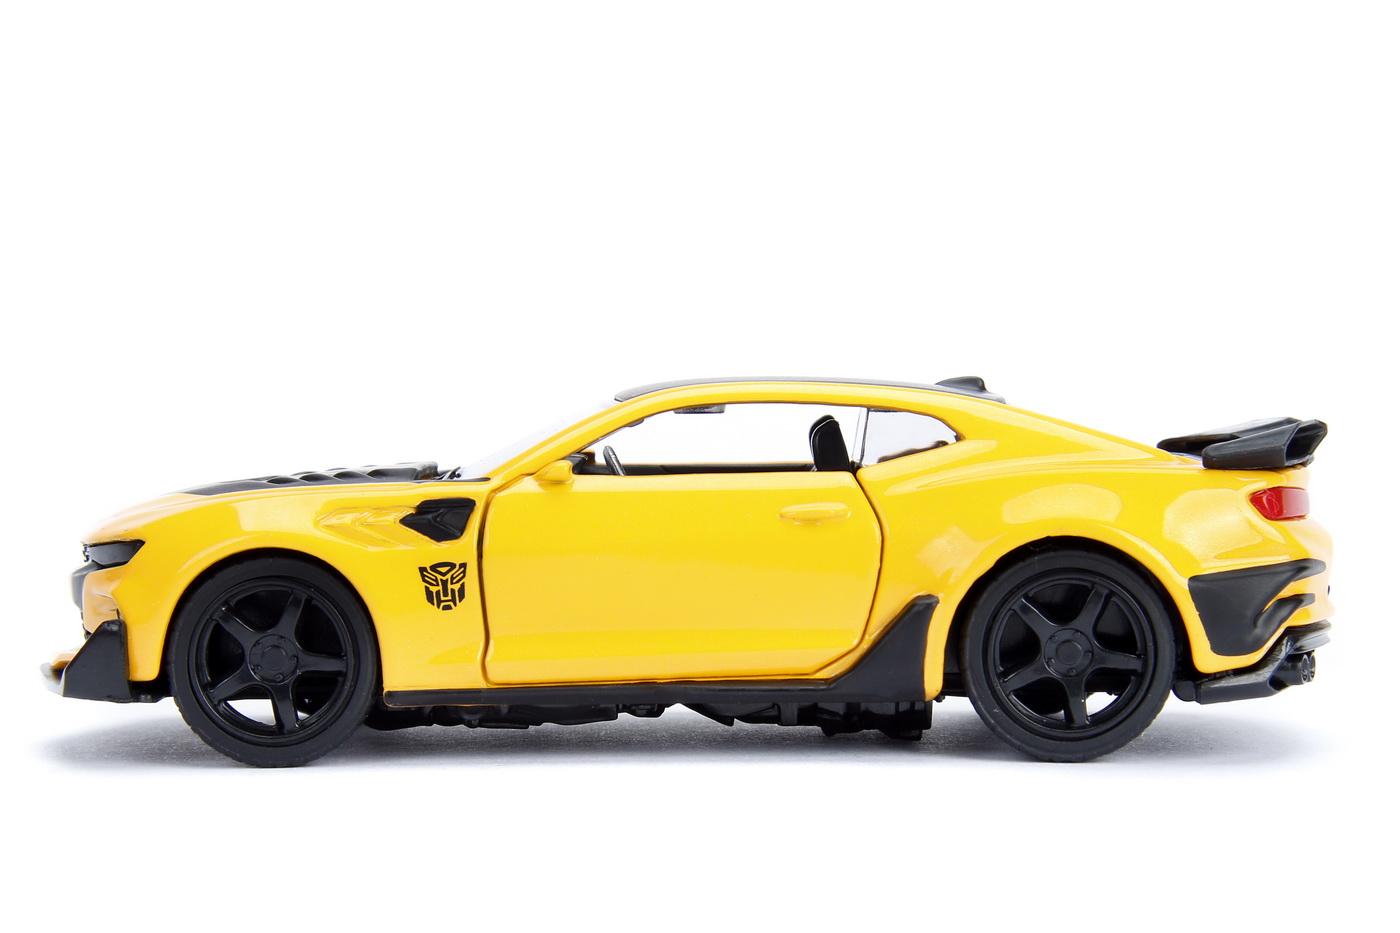 Masinuta Metalica Transformers 2016 Chevy Camaro Scara 1 La 32   JadaToys - 2